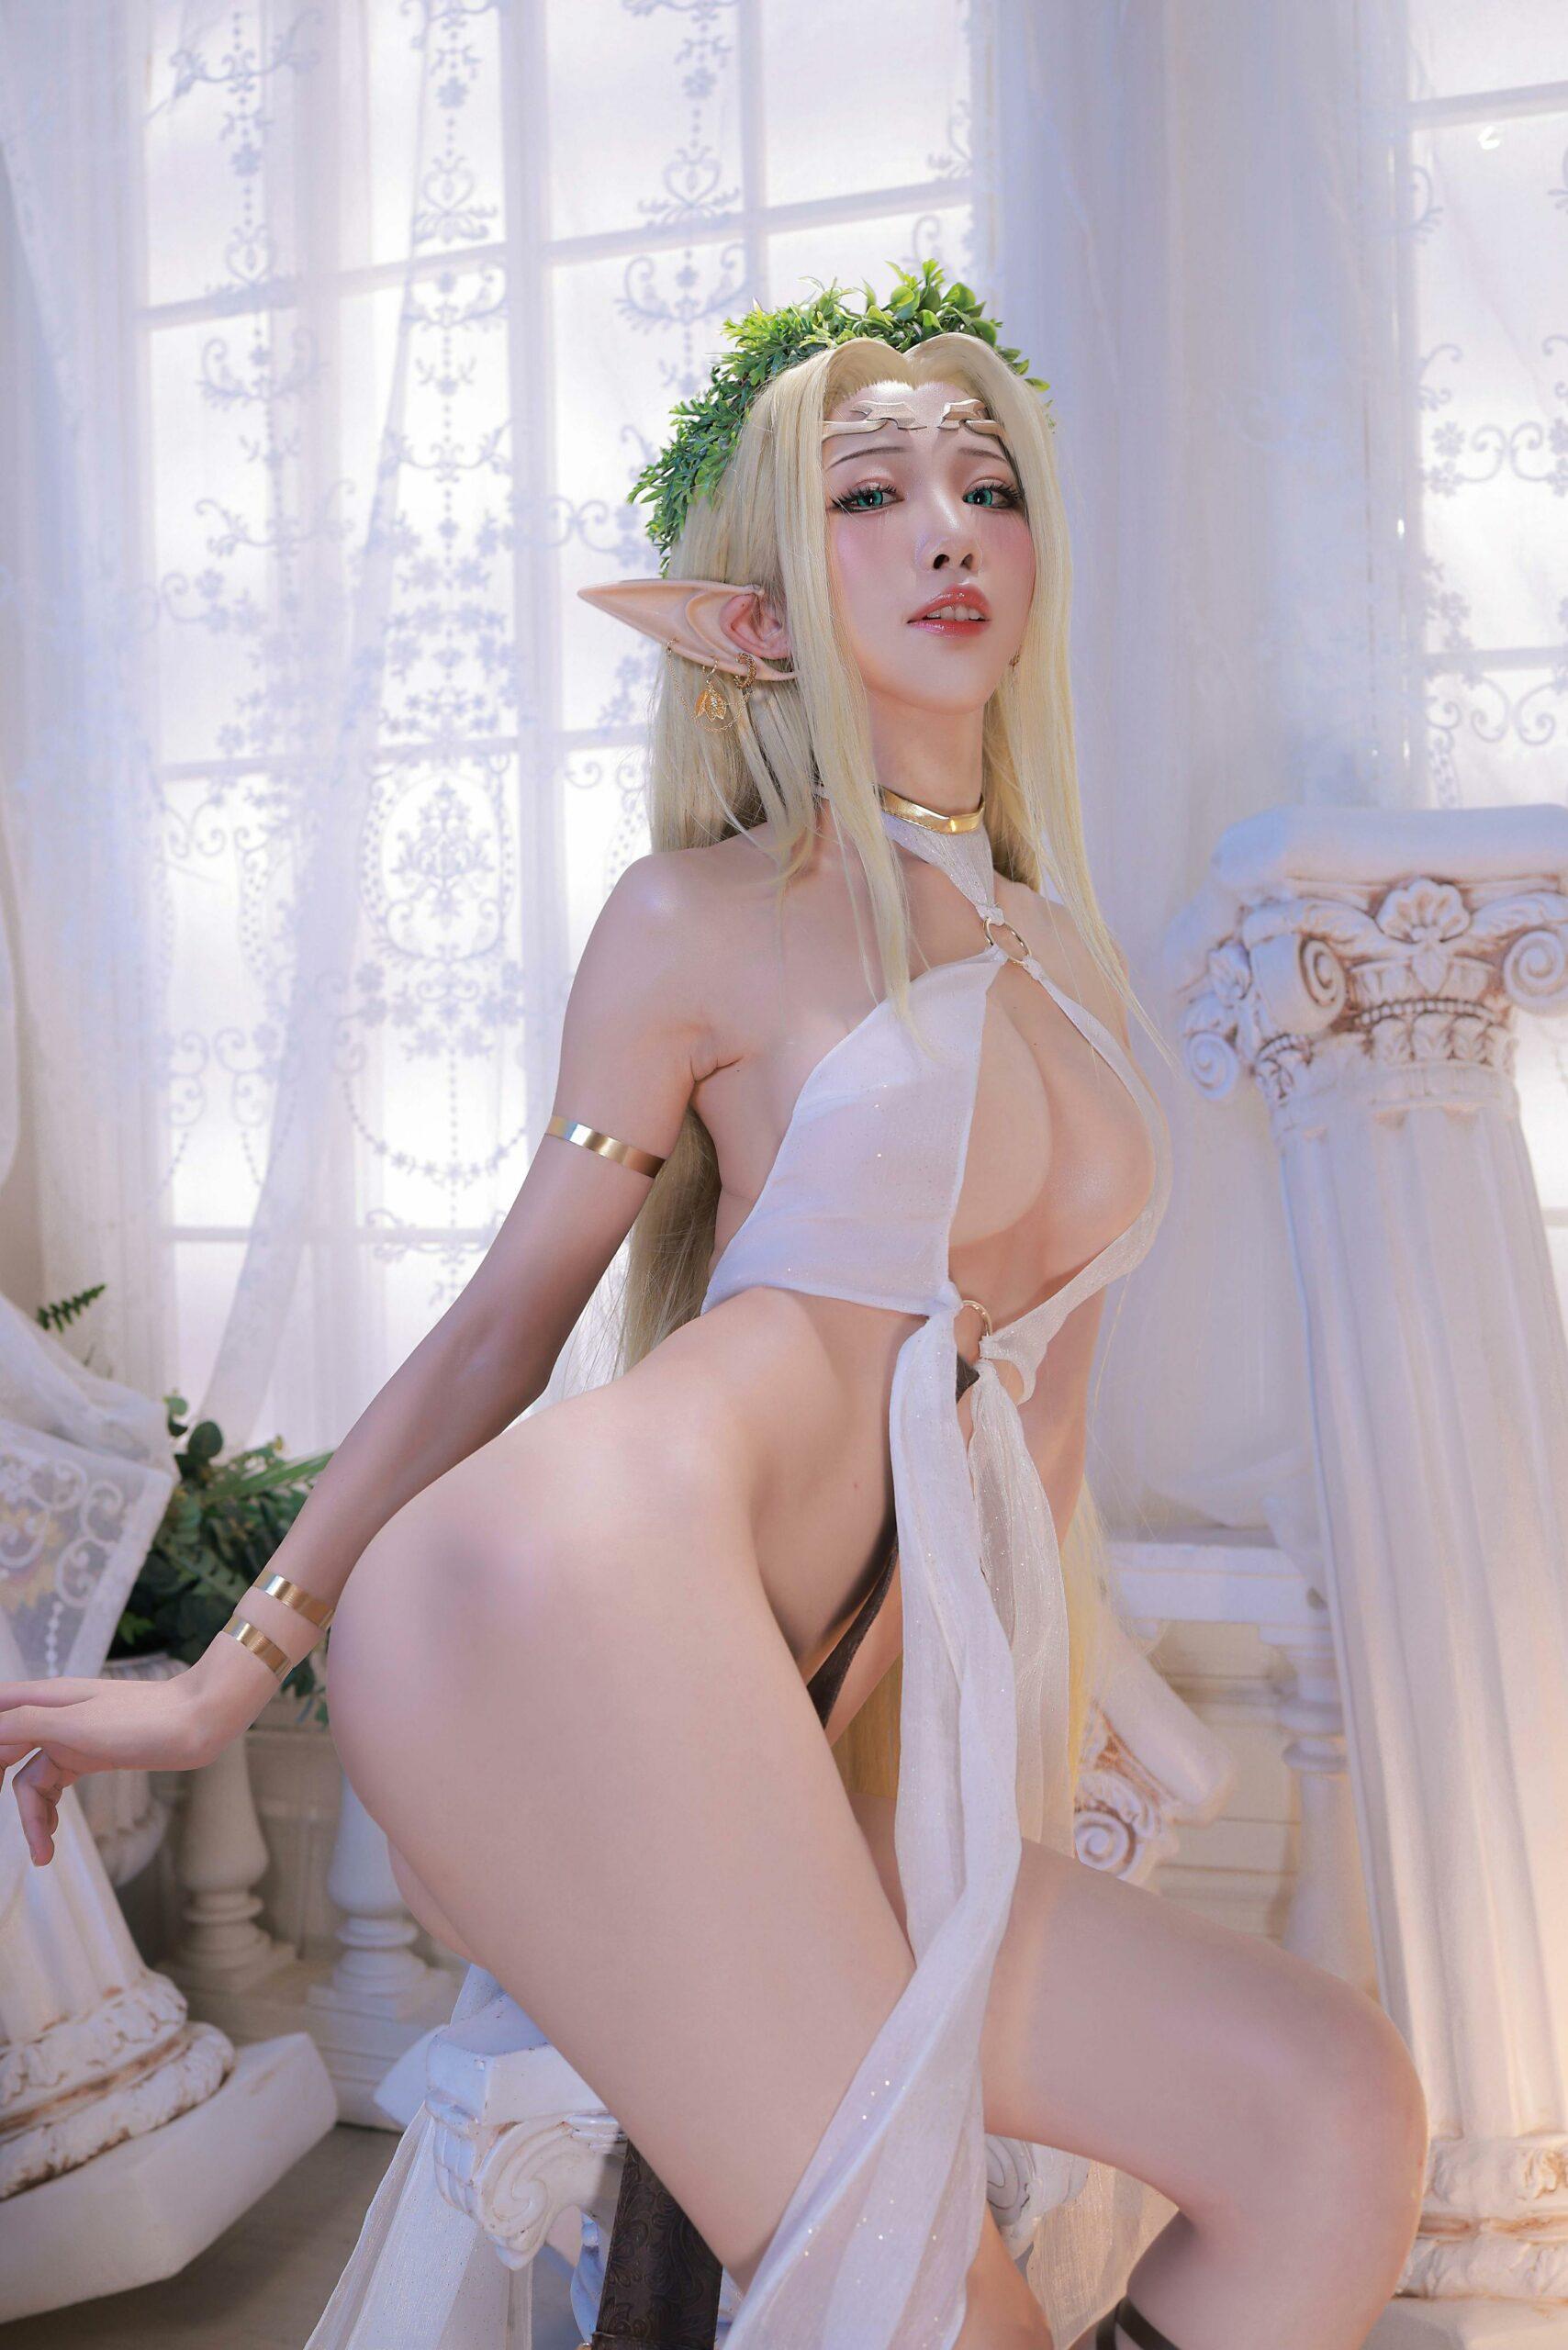 Kuroinu Celestine Cosplay by Aqua 38